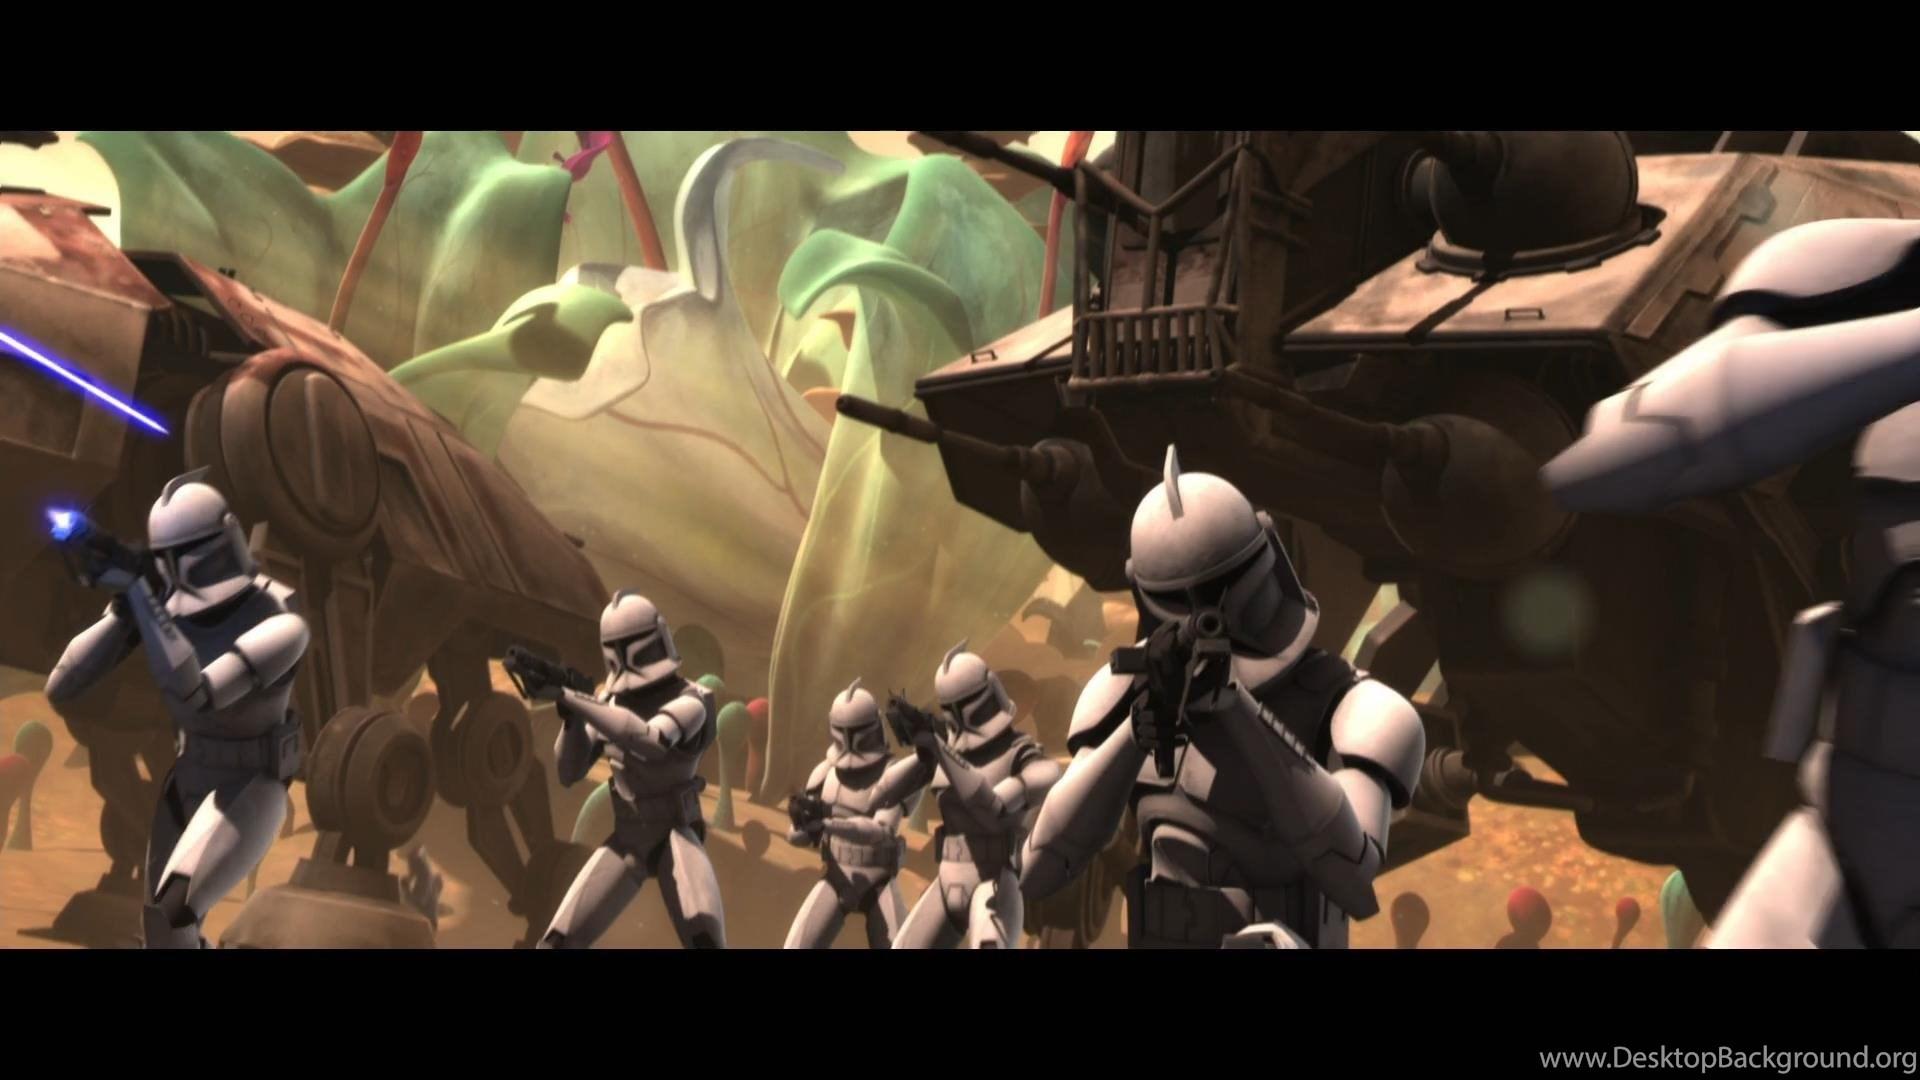 Star Wars The Clone Wars Season 2 Wallpapers Pack Album On Imgur